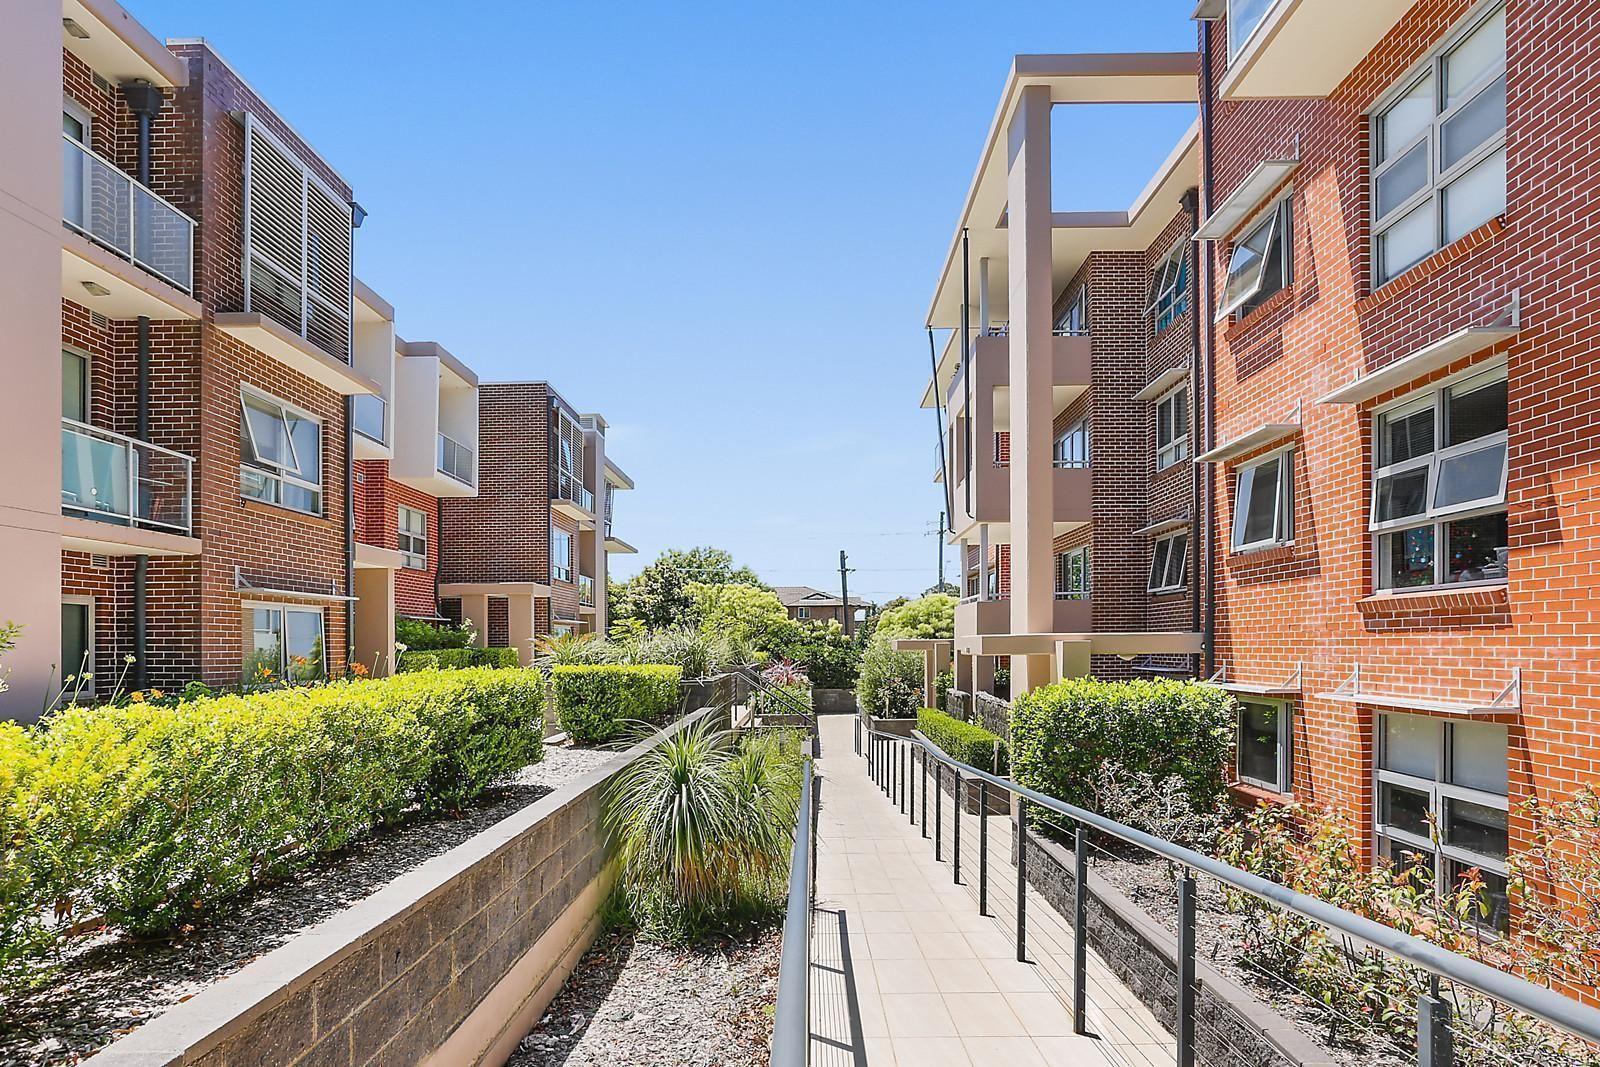 21/500 President Avenue, Sutherland NSW 2232, Image 0